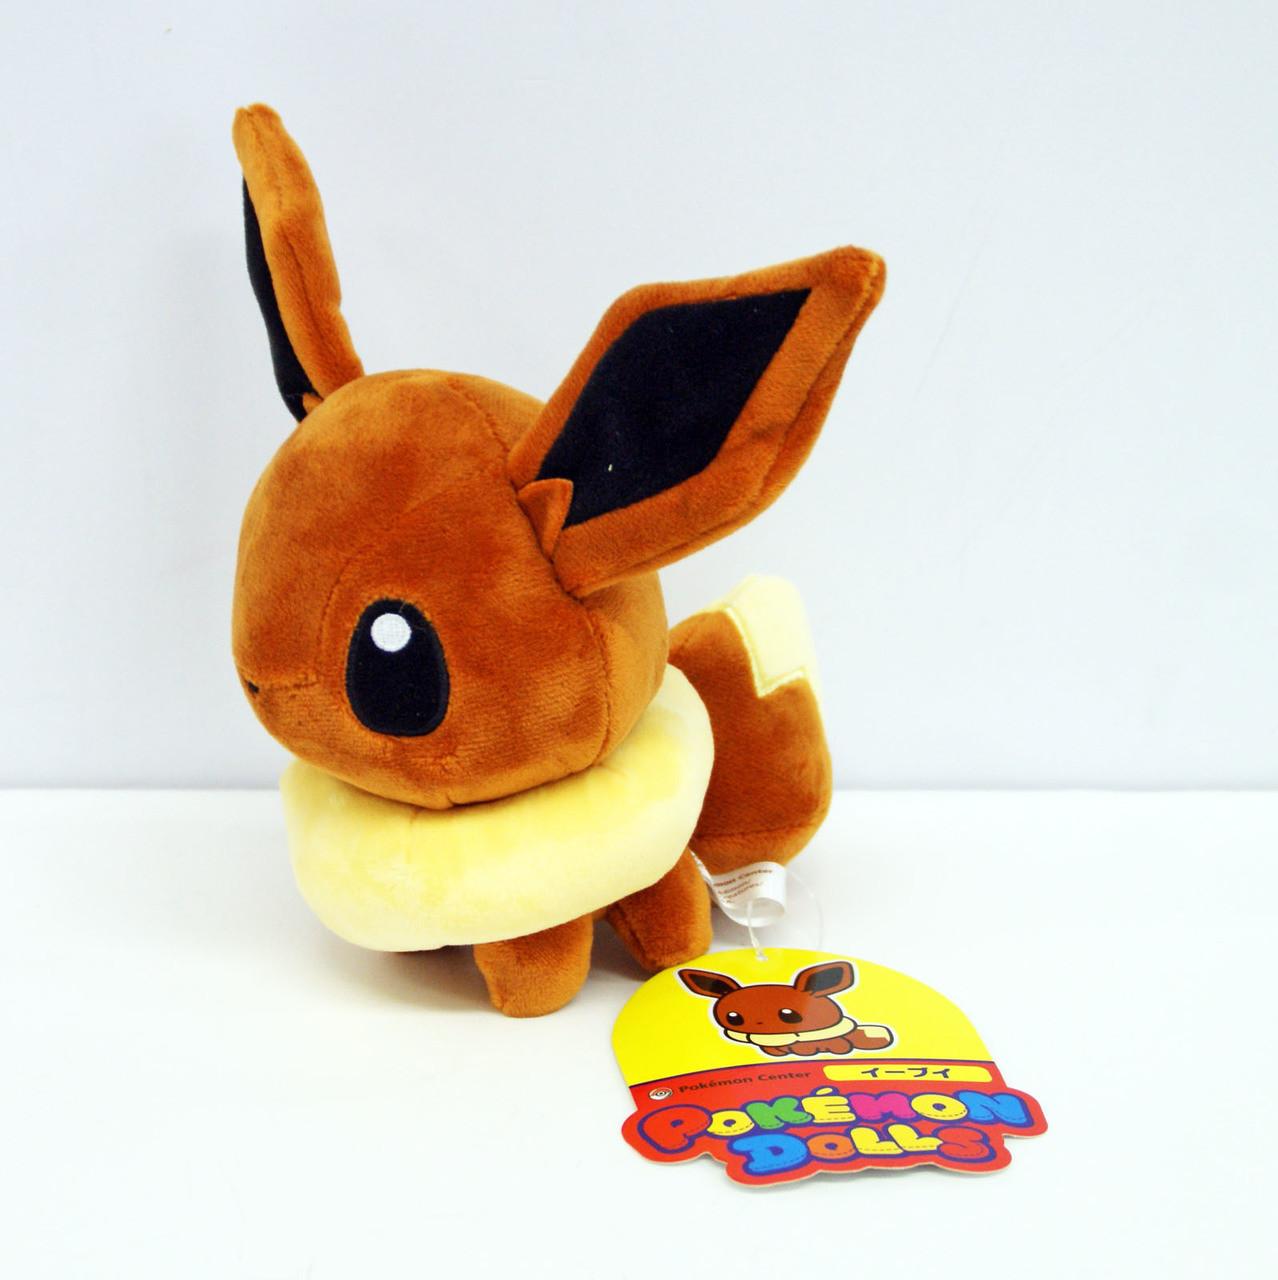 Eievui Pokemon Center Original Plush Doll Mascot Yurutto Eevee 4521329253633